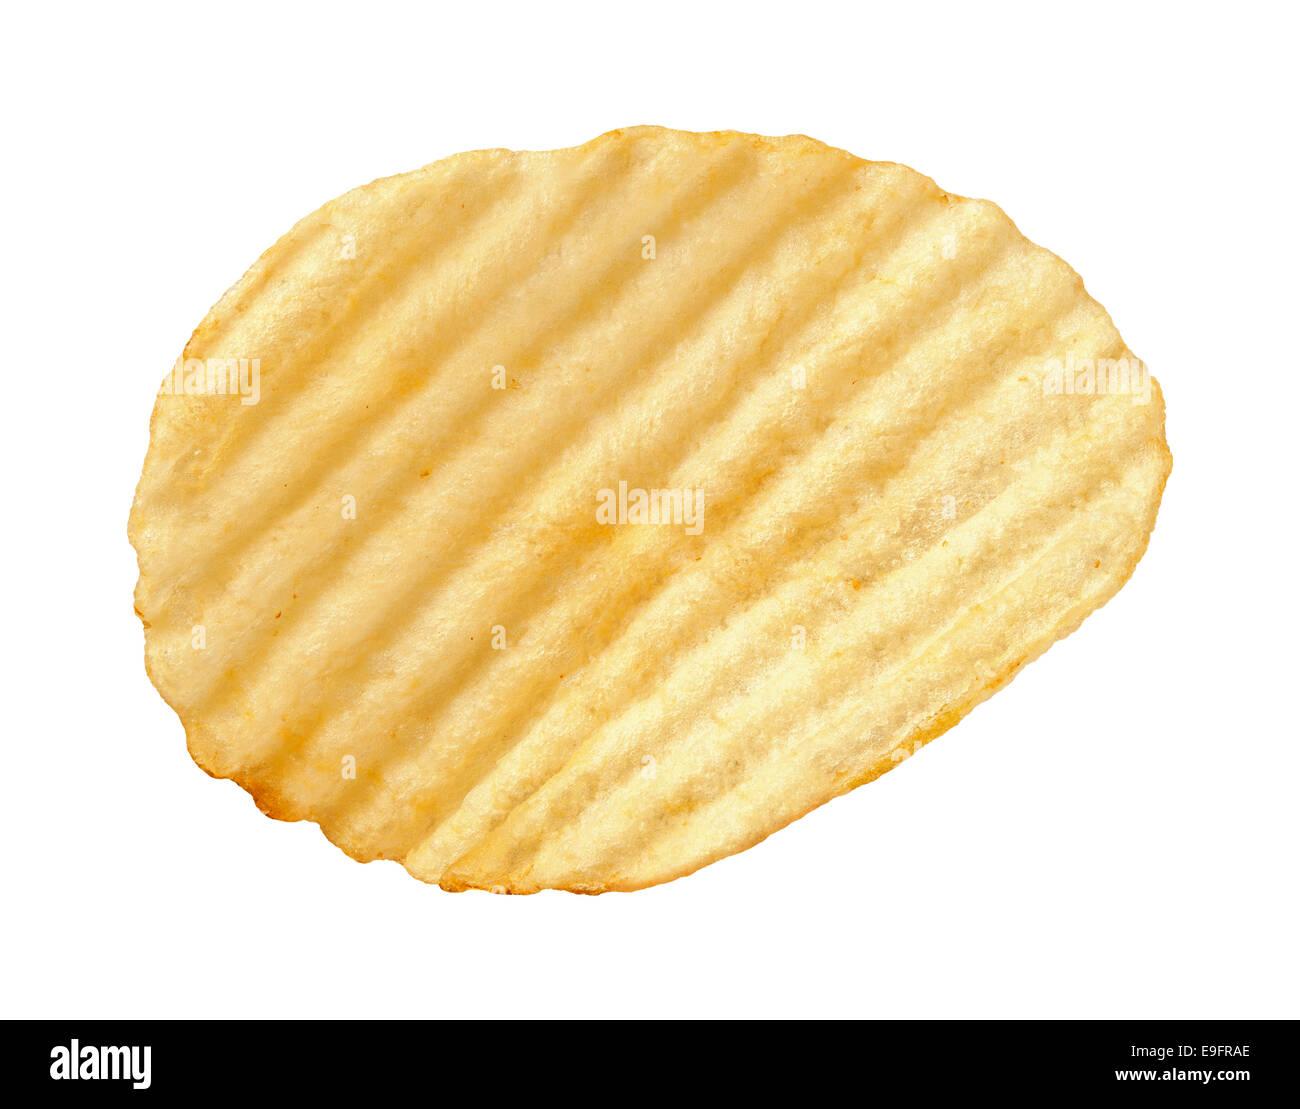 A single wavy potato chip with ridges - Stock Image